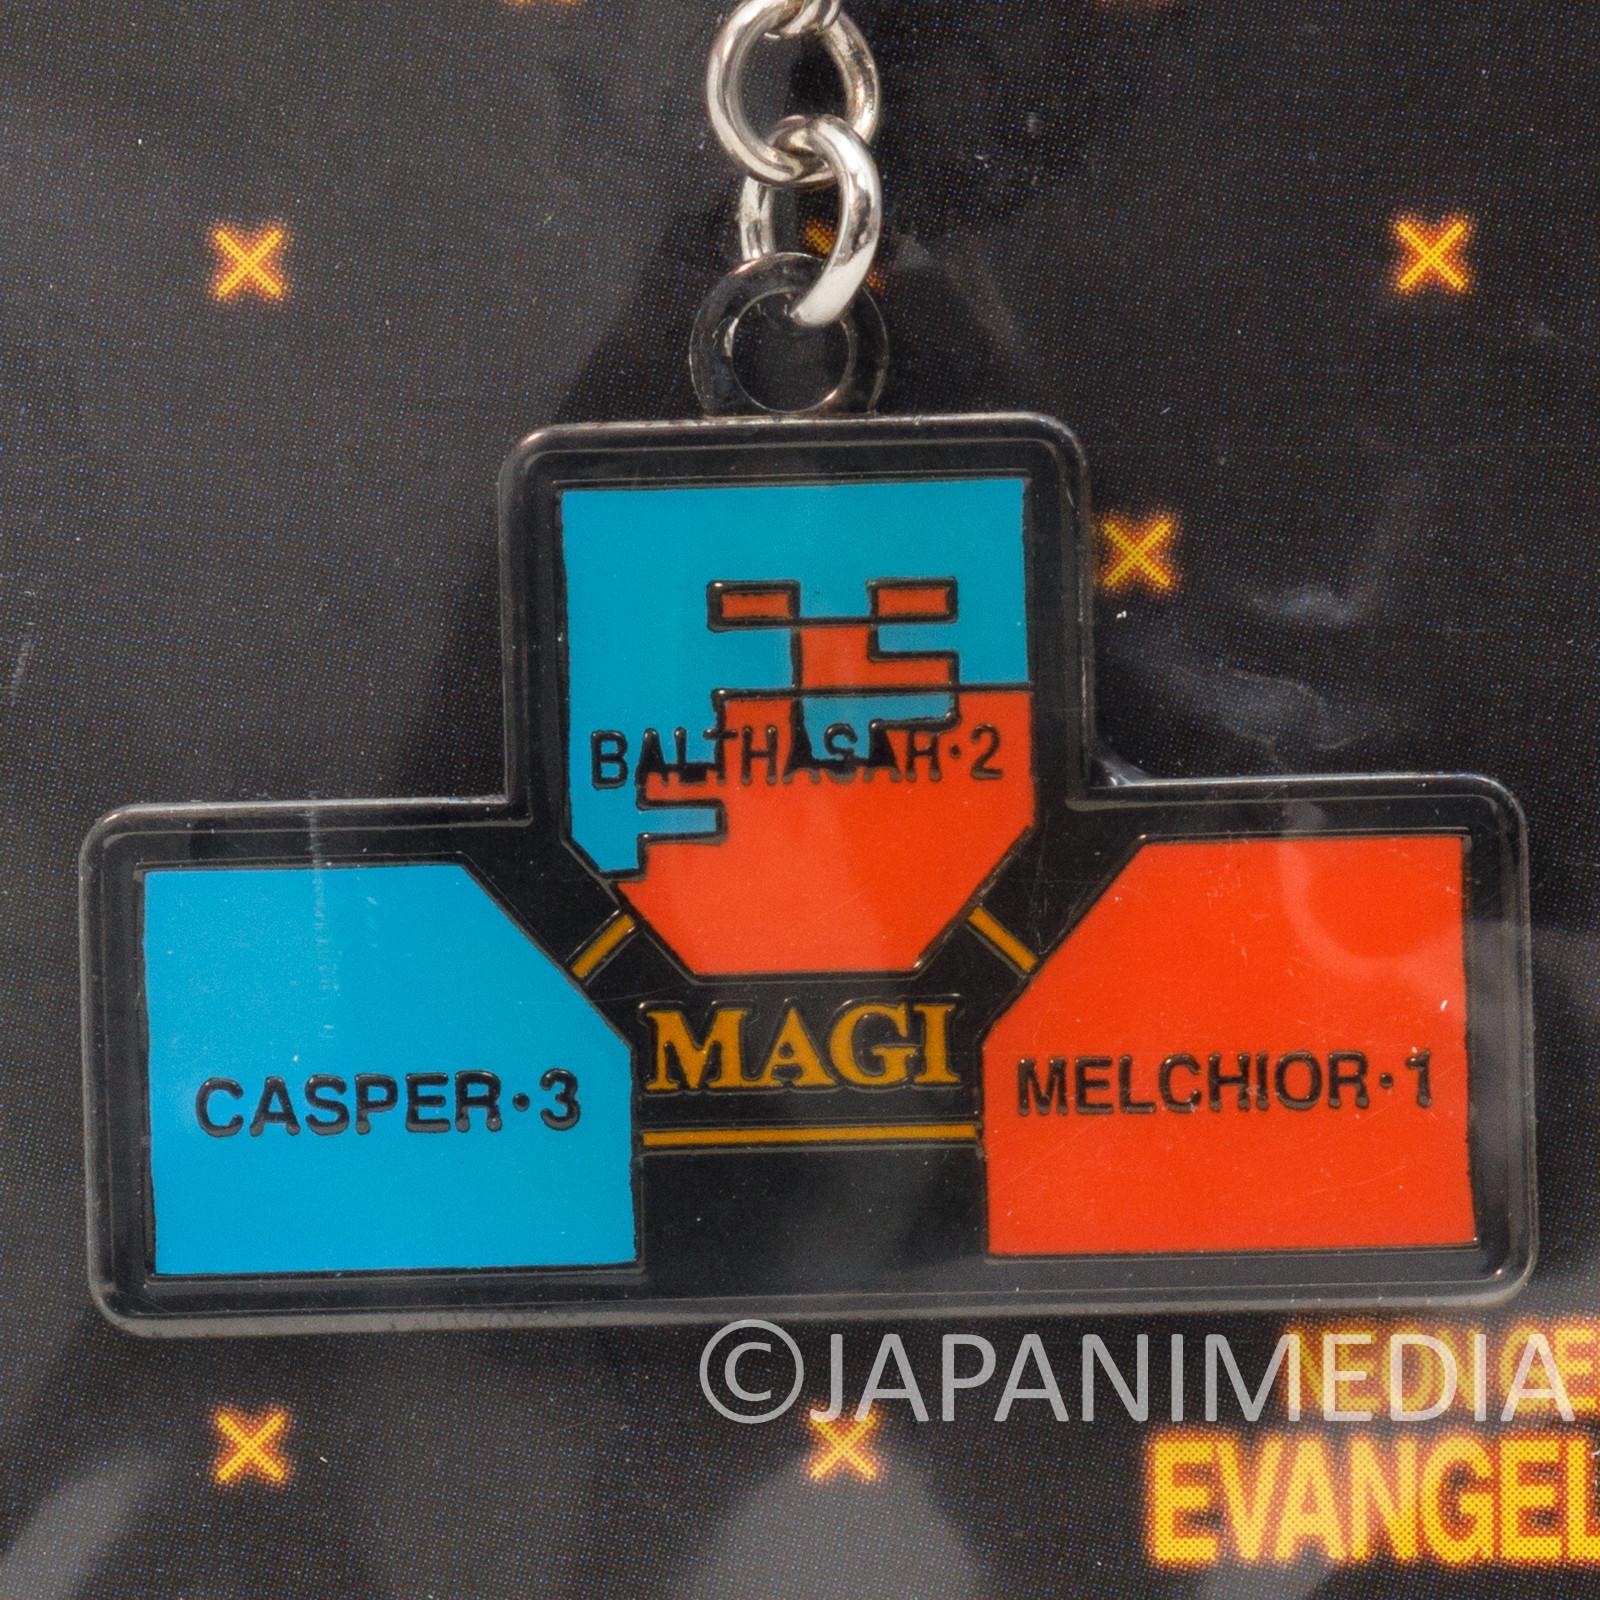 Evangelion 11th Angel Shito Ireul Mascot Charm Fastener Accessories JAPAN ANIME